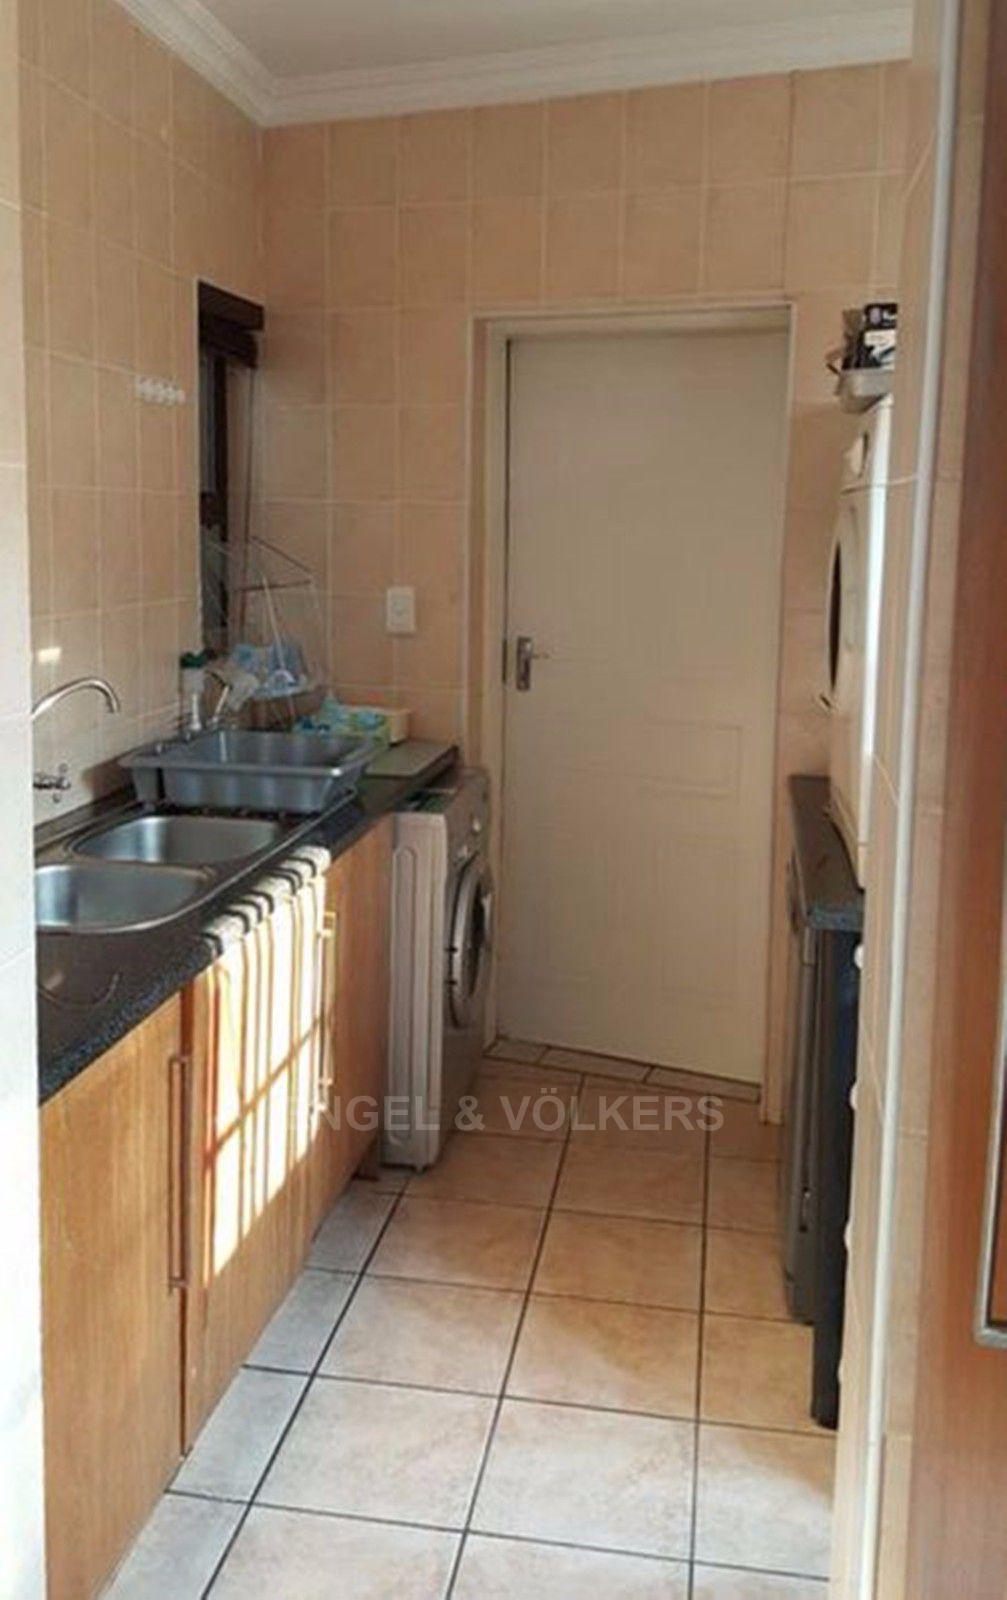 Irene View Estate property for sale. Ref No: 13388279. Picture no 19